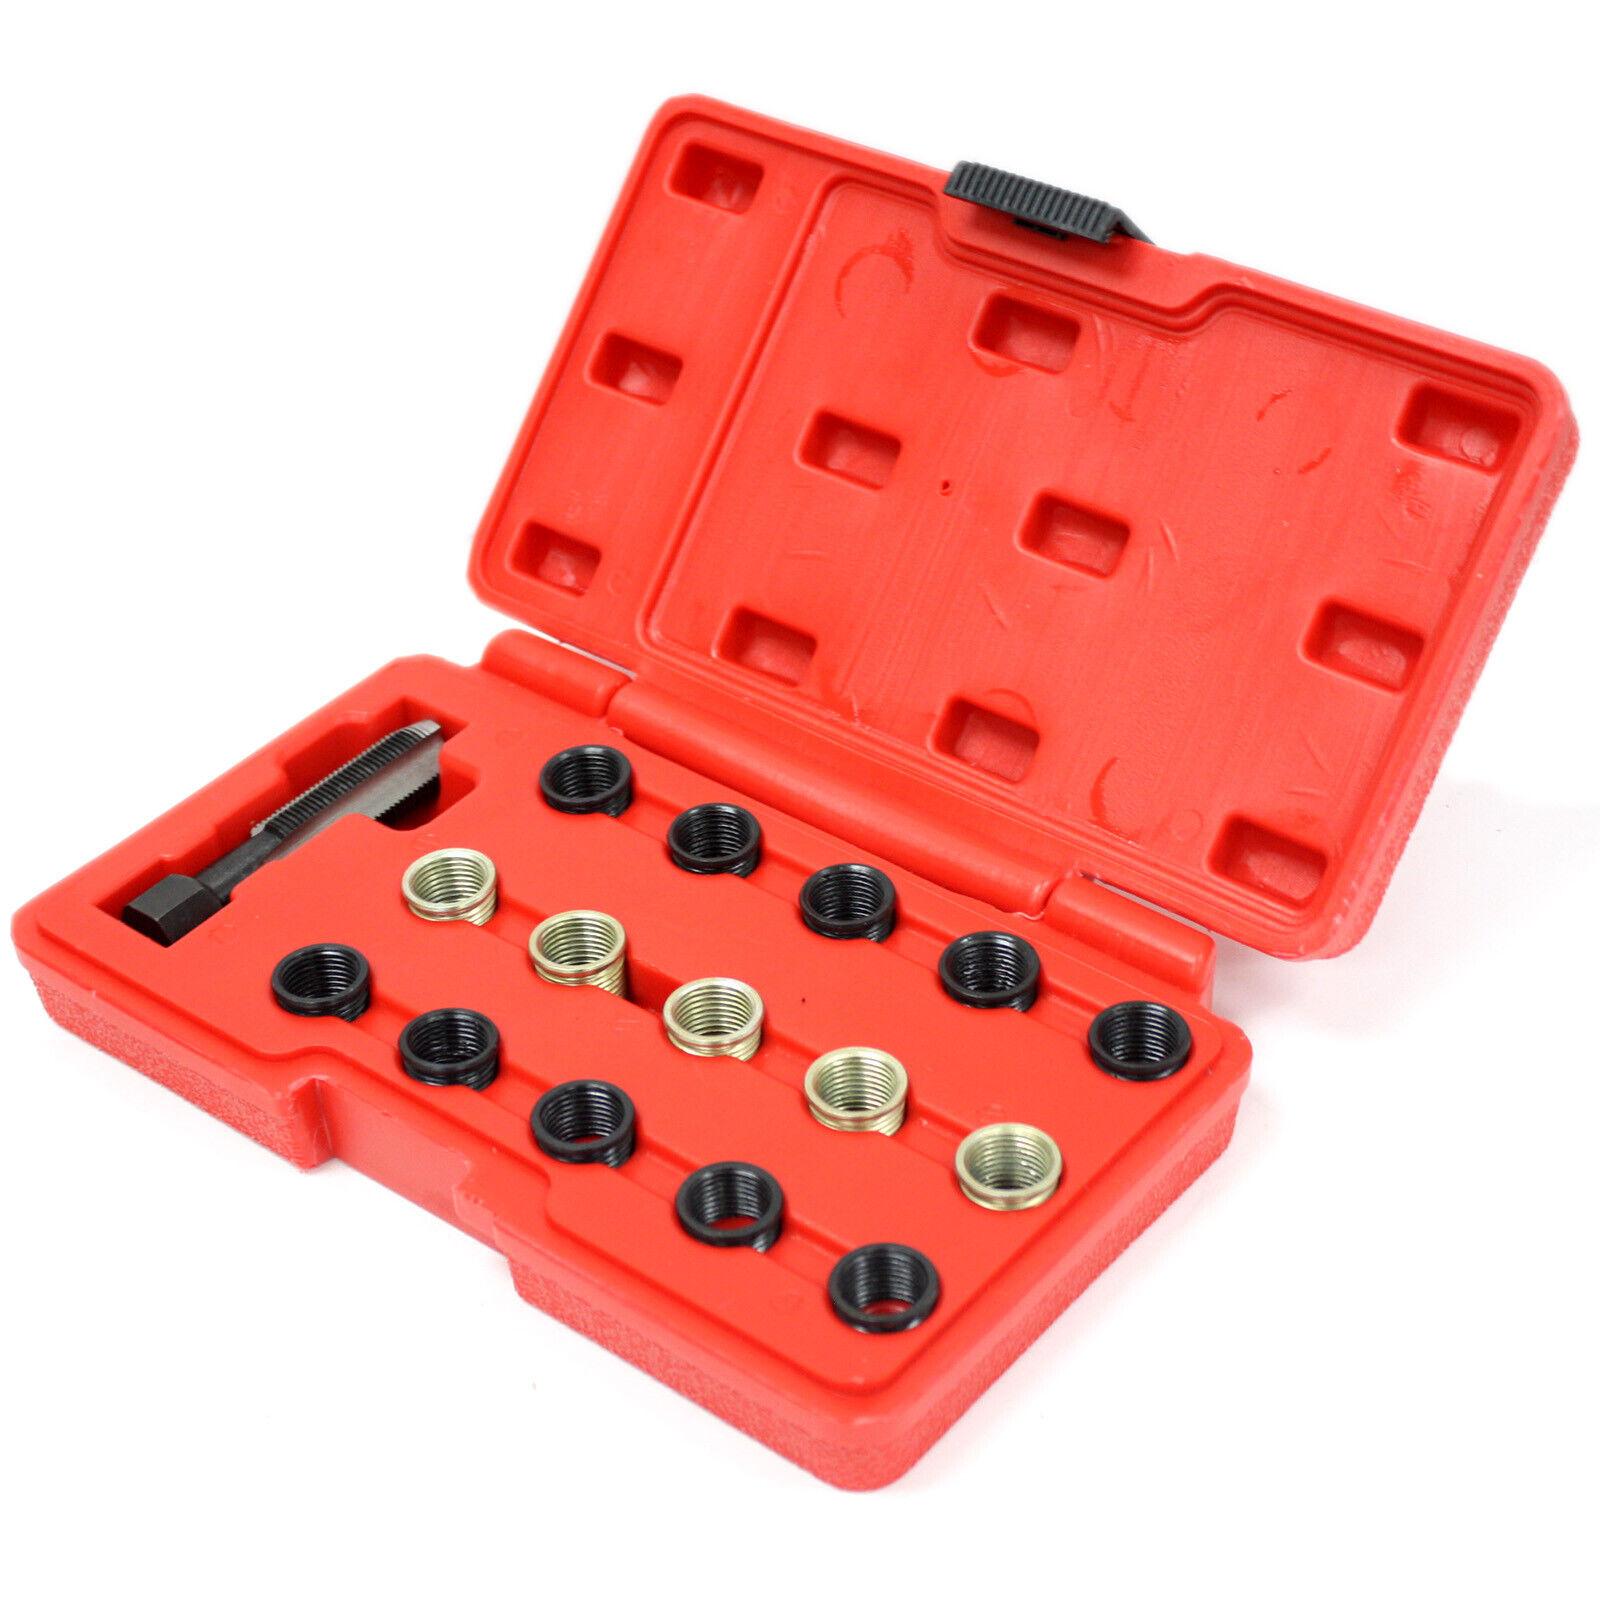 M10 x 1.0 Wire Type Spark Plug Repair Kit 10MM X 1.0 USA Perma-Coil 1210-410